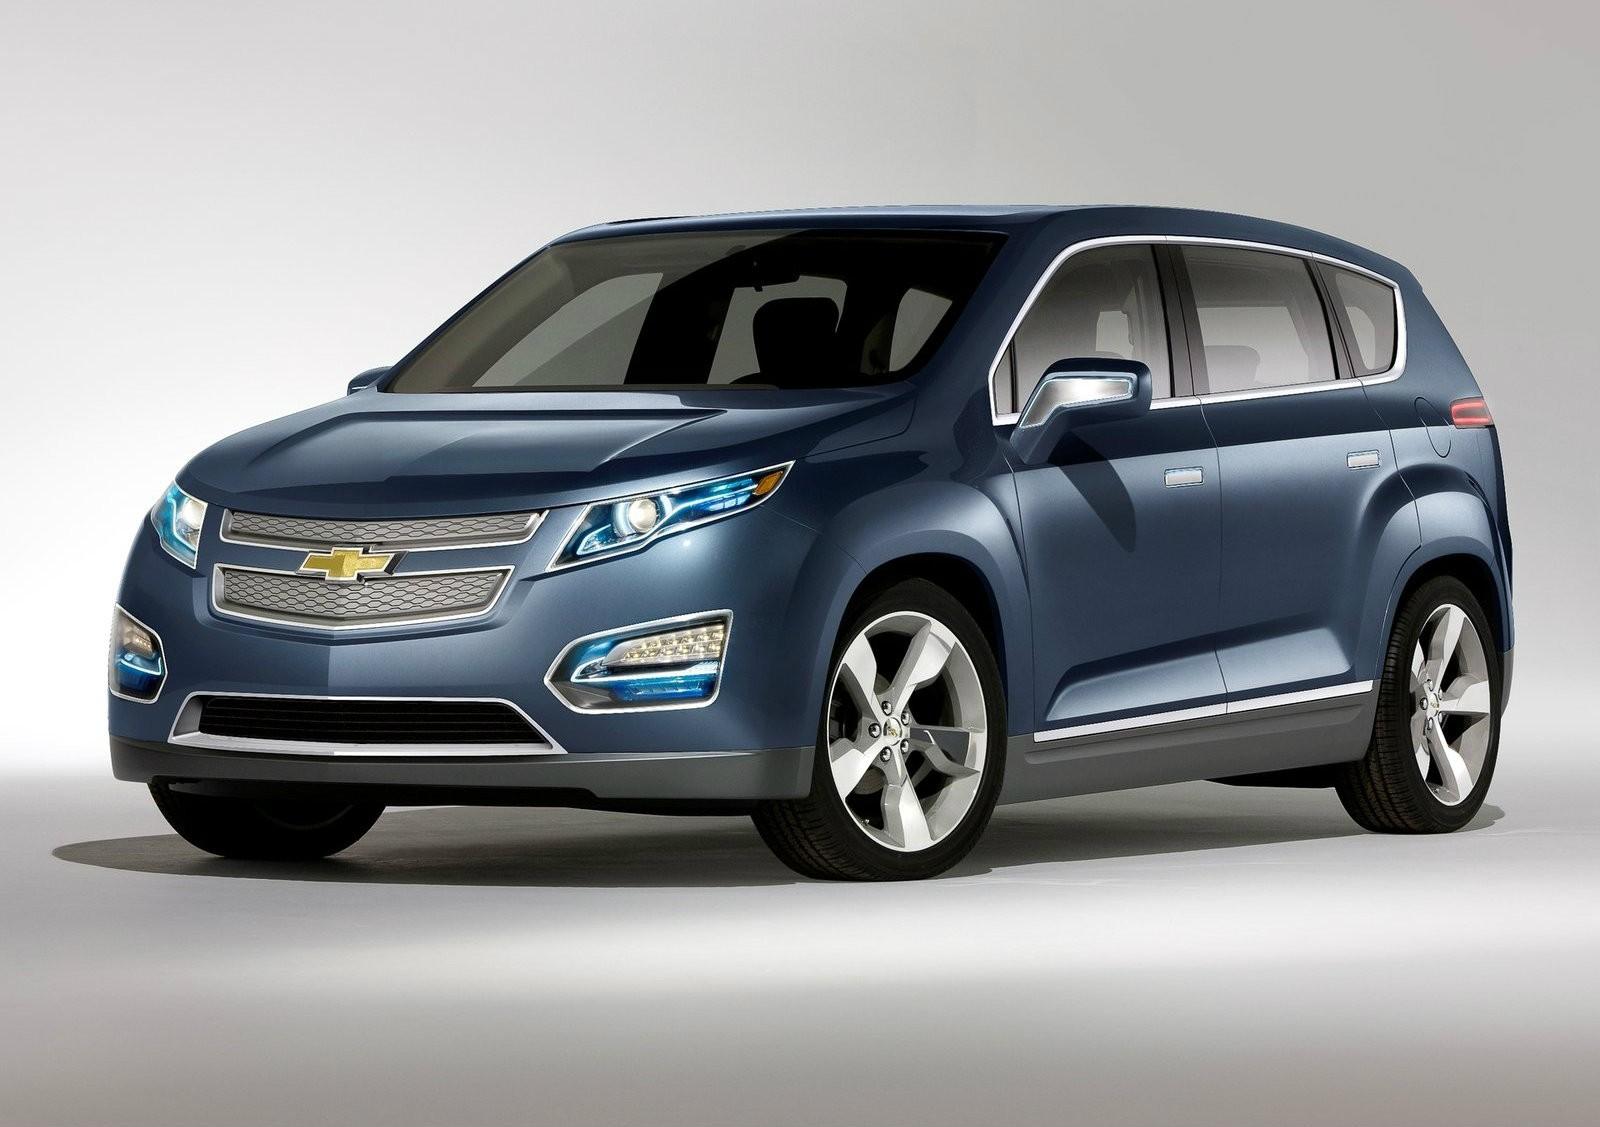 Chevrolet Crossvolt Trademark May Lead to a Plug-in Hybrid ...